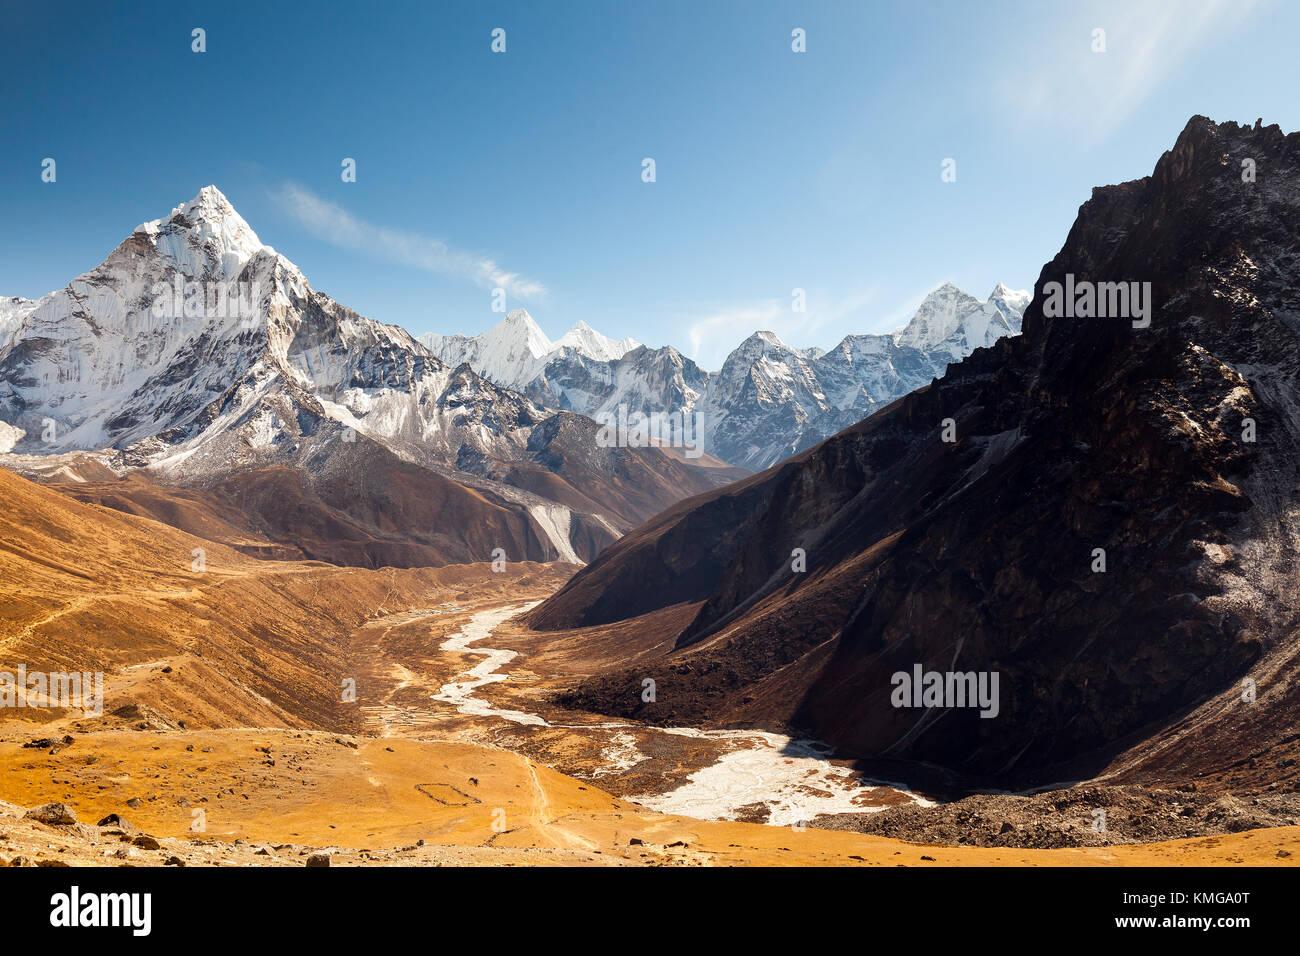 Ama Dablam, Everest region, Himalaya, Nepal - Stock Image